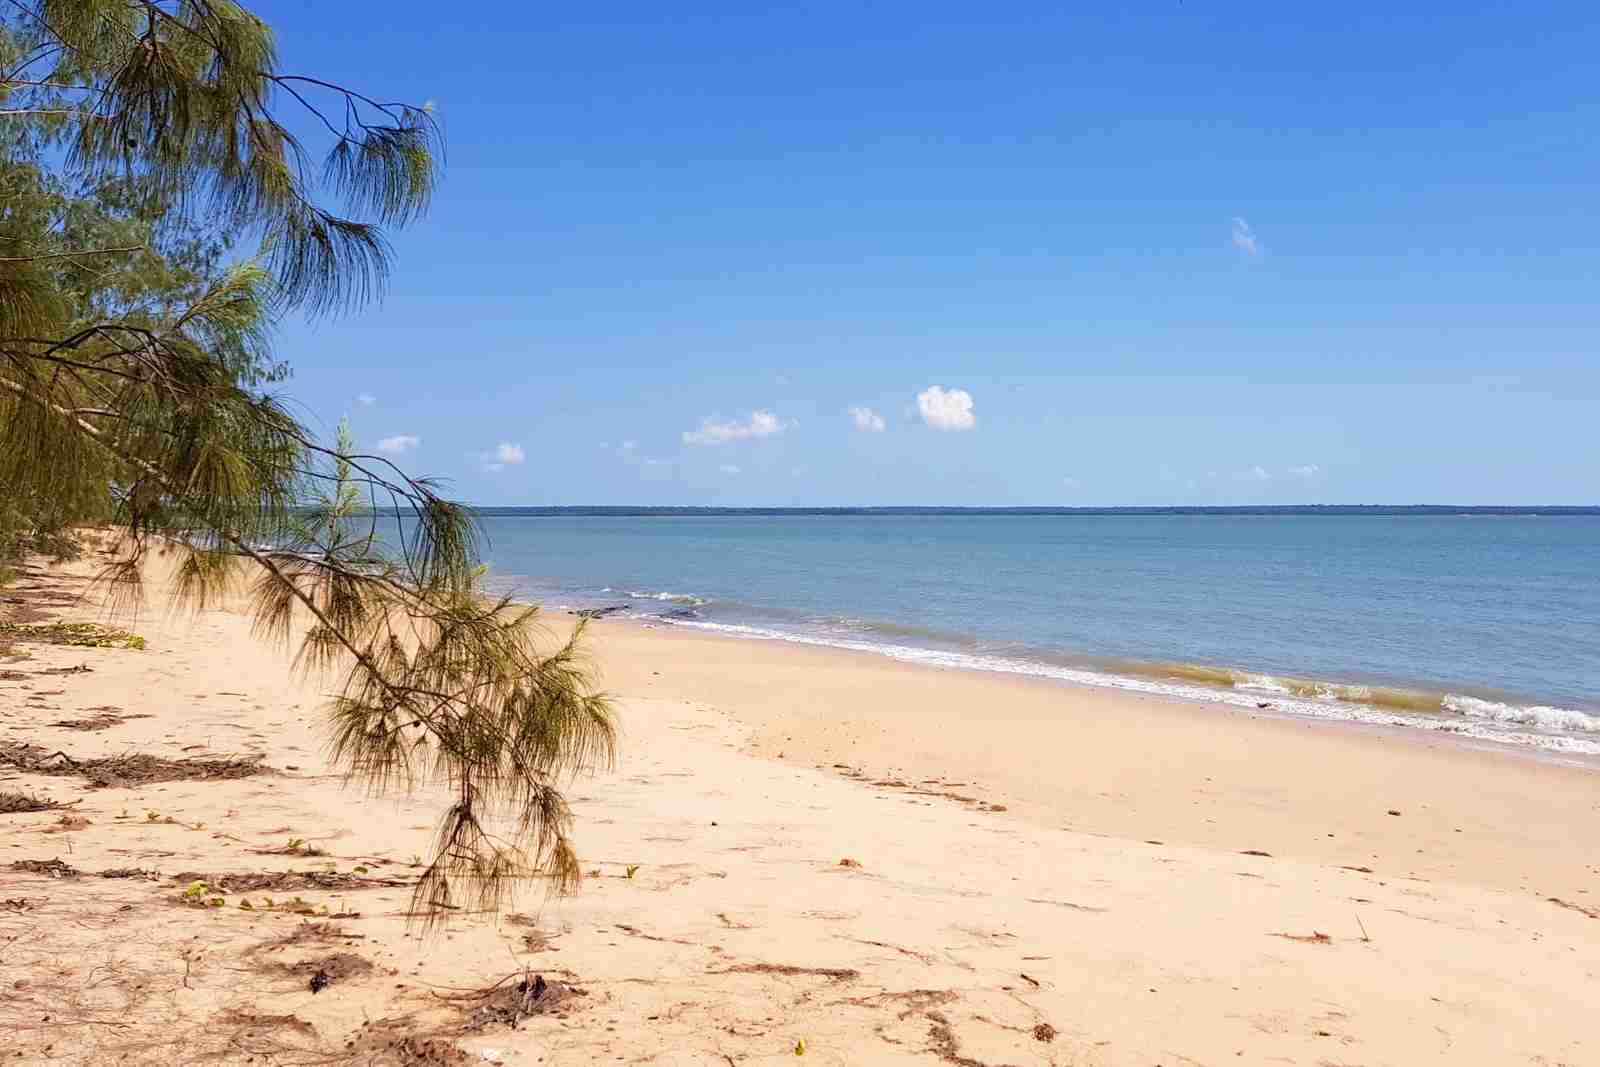 A beach on the Tiwi Islands, Northern Territory. (Photo via Shutterstock)